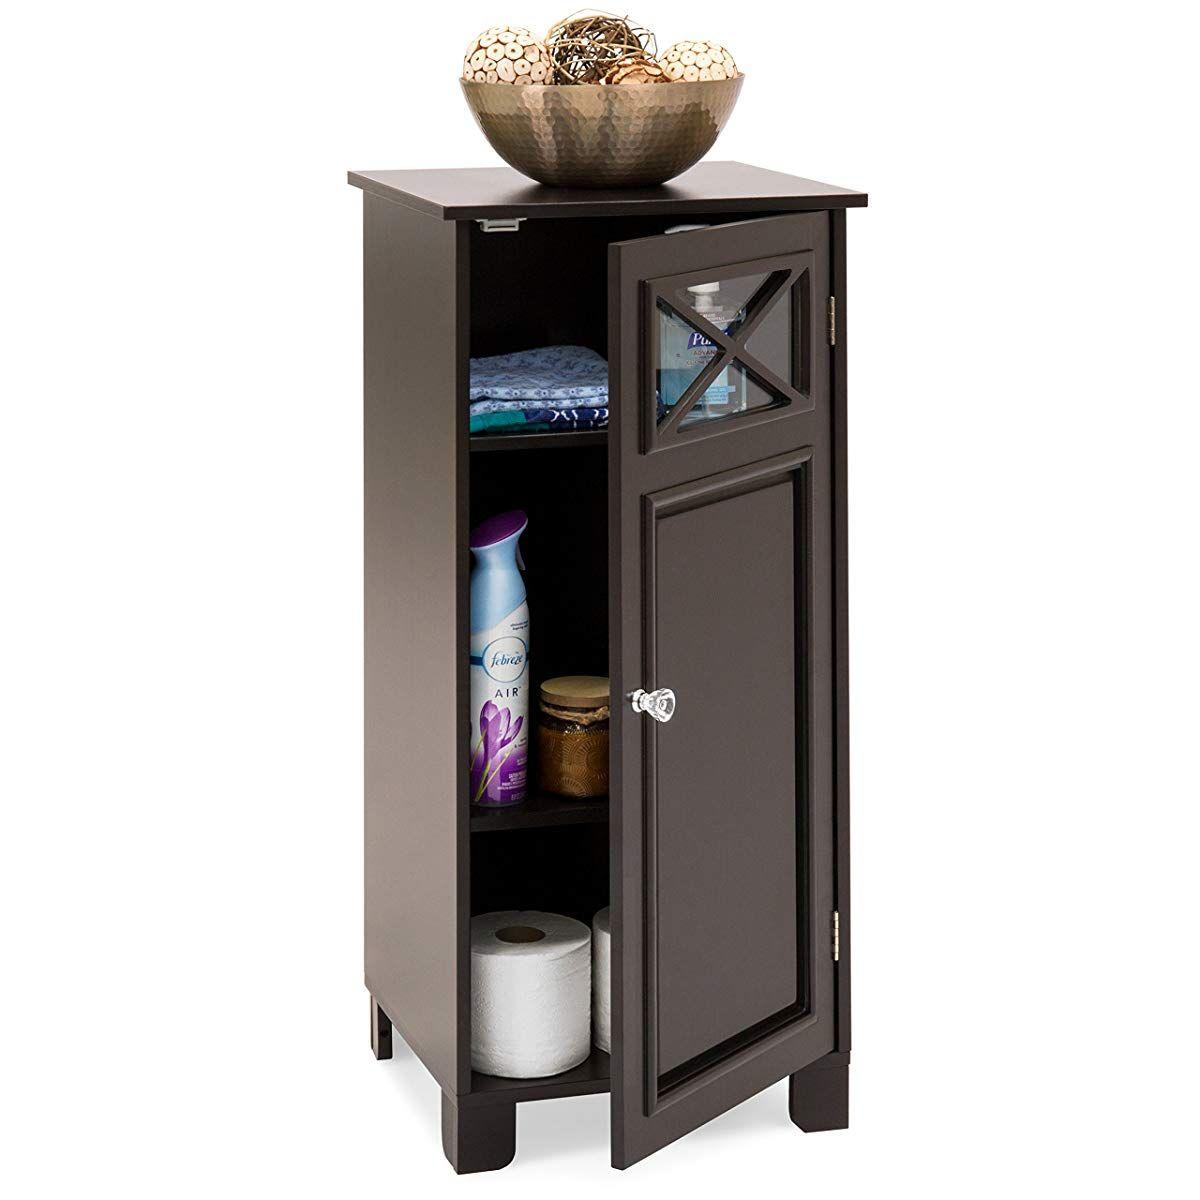 Small Floor Cabinet With Door Espresso Storage Cabinets Adjustable Shelving Storage And Organization Small storage cabinets with doors